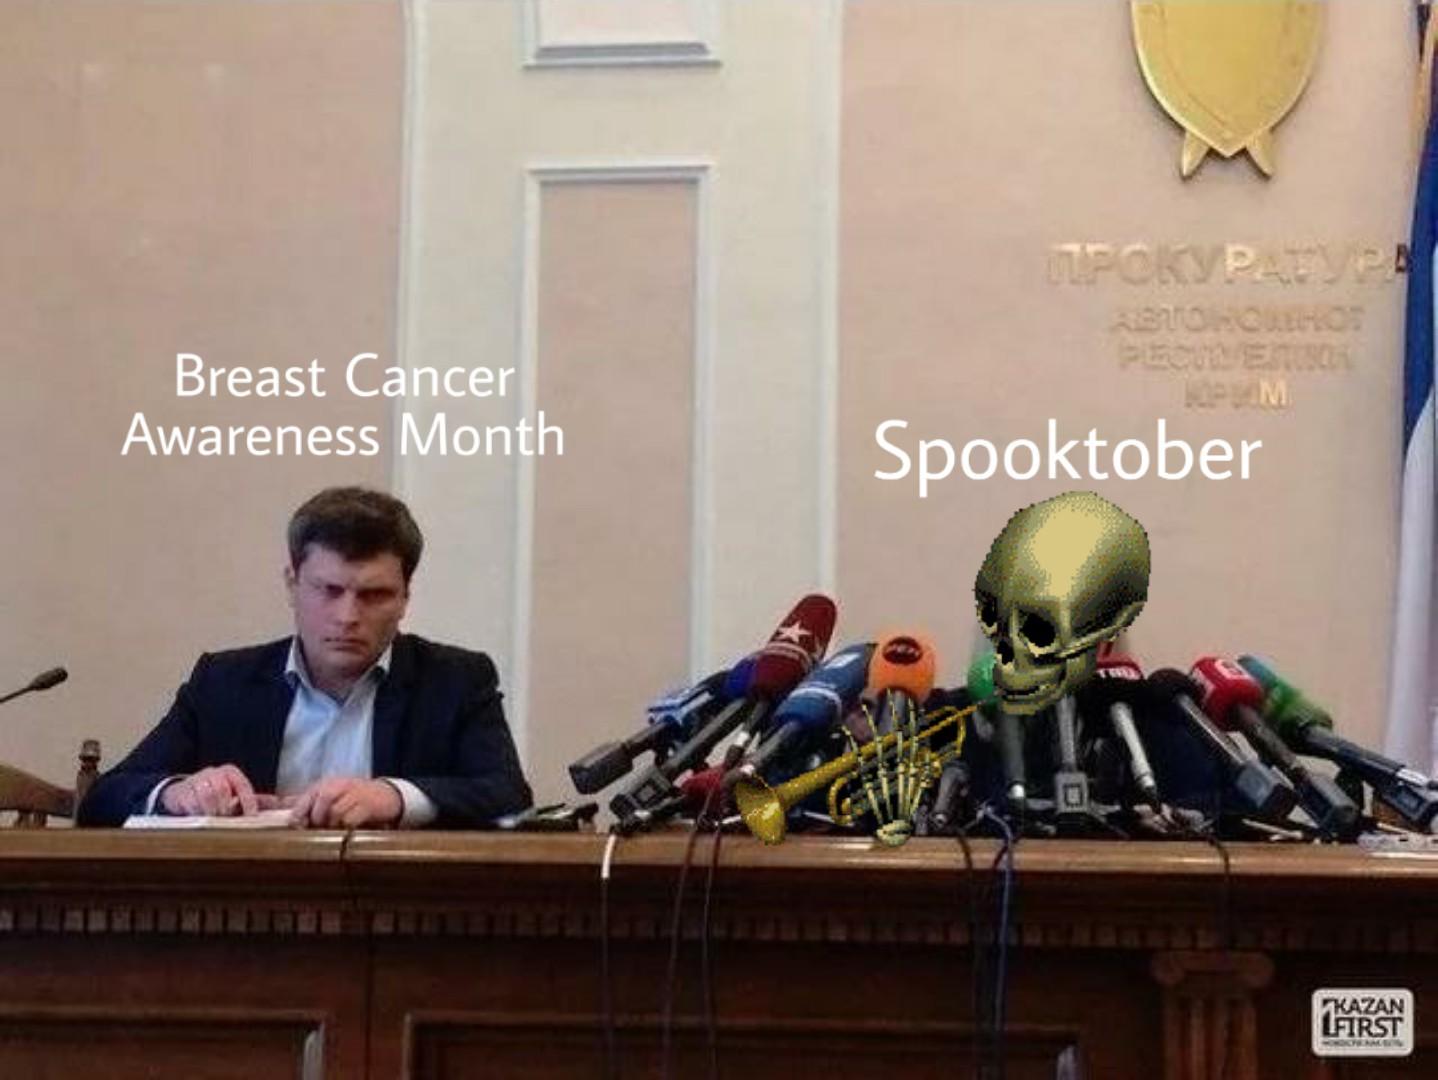 Boob Doot - meme